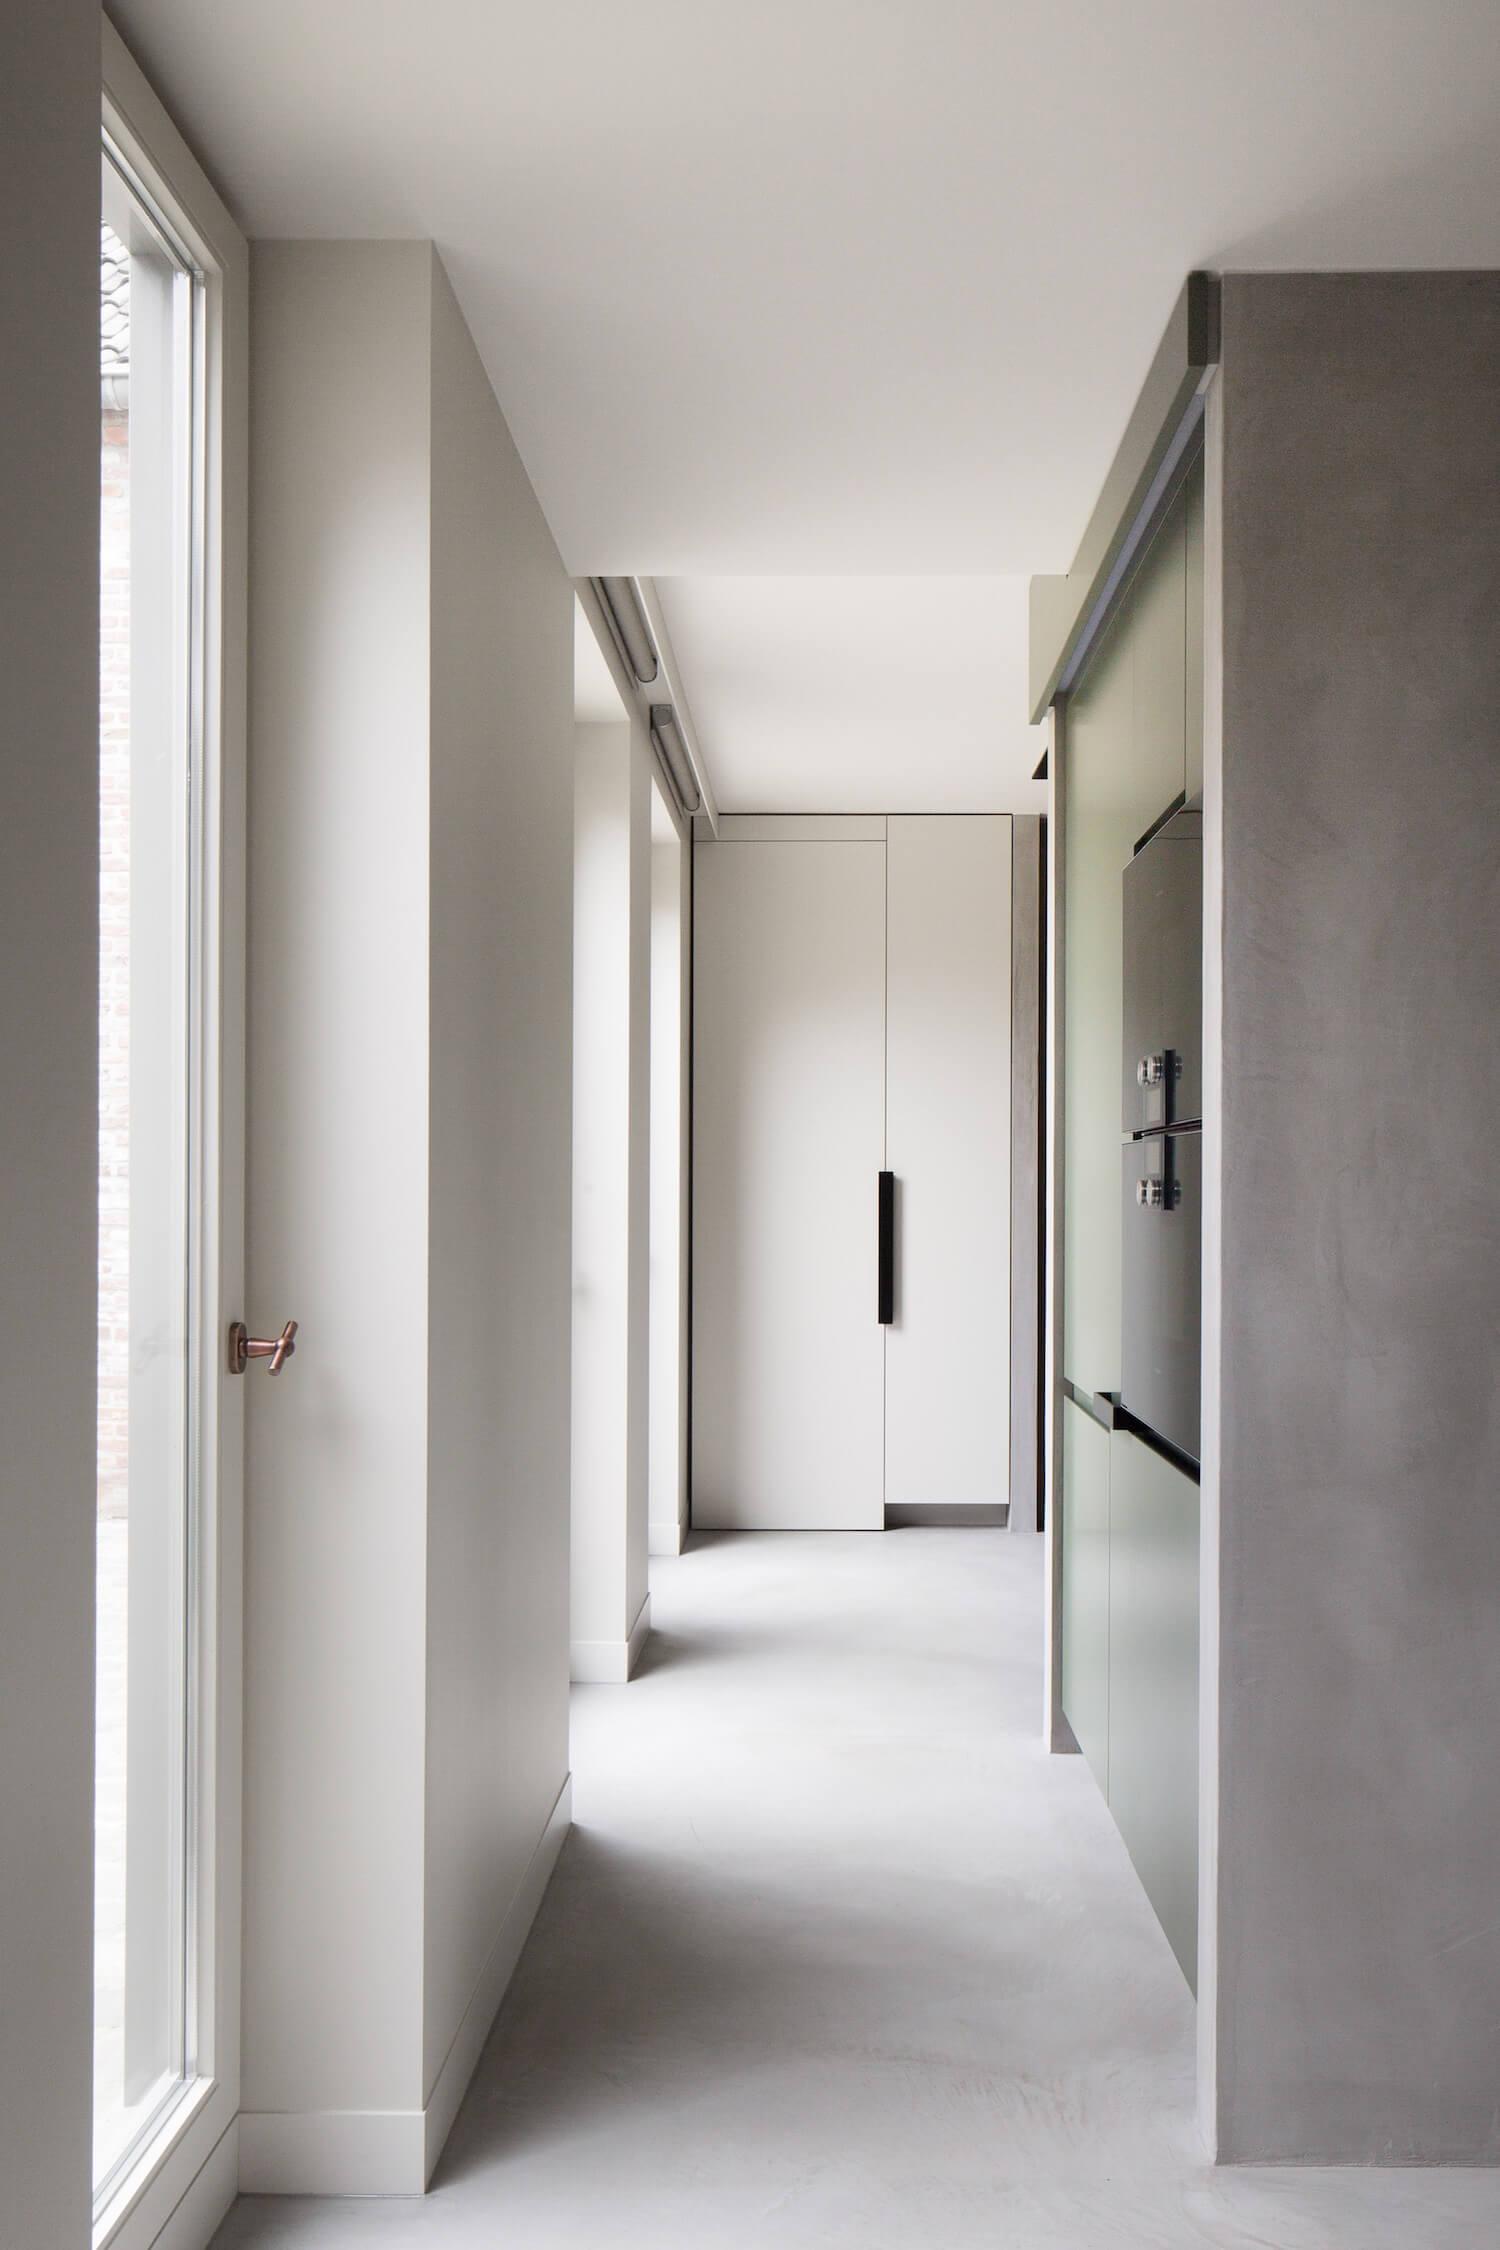 est living frederic kielemoes cafeine belgian apartment 9